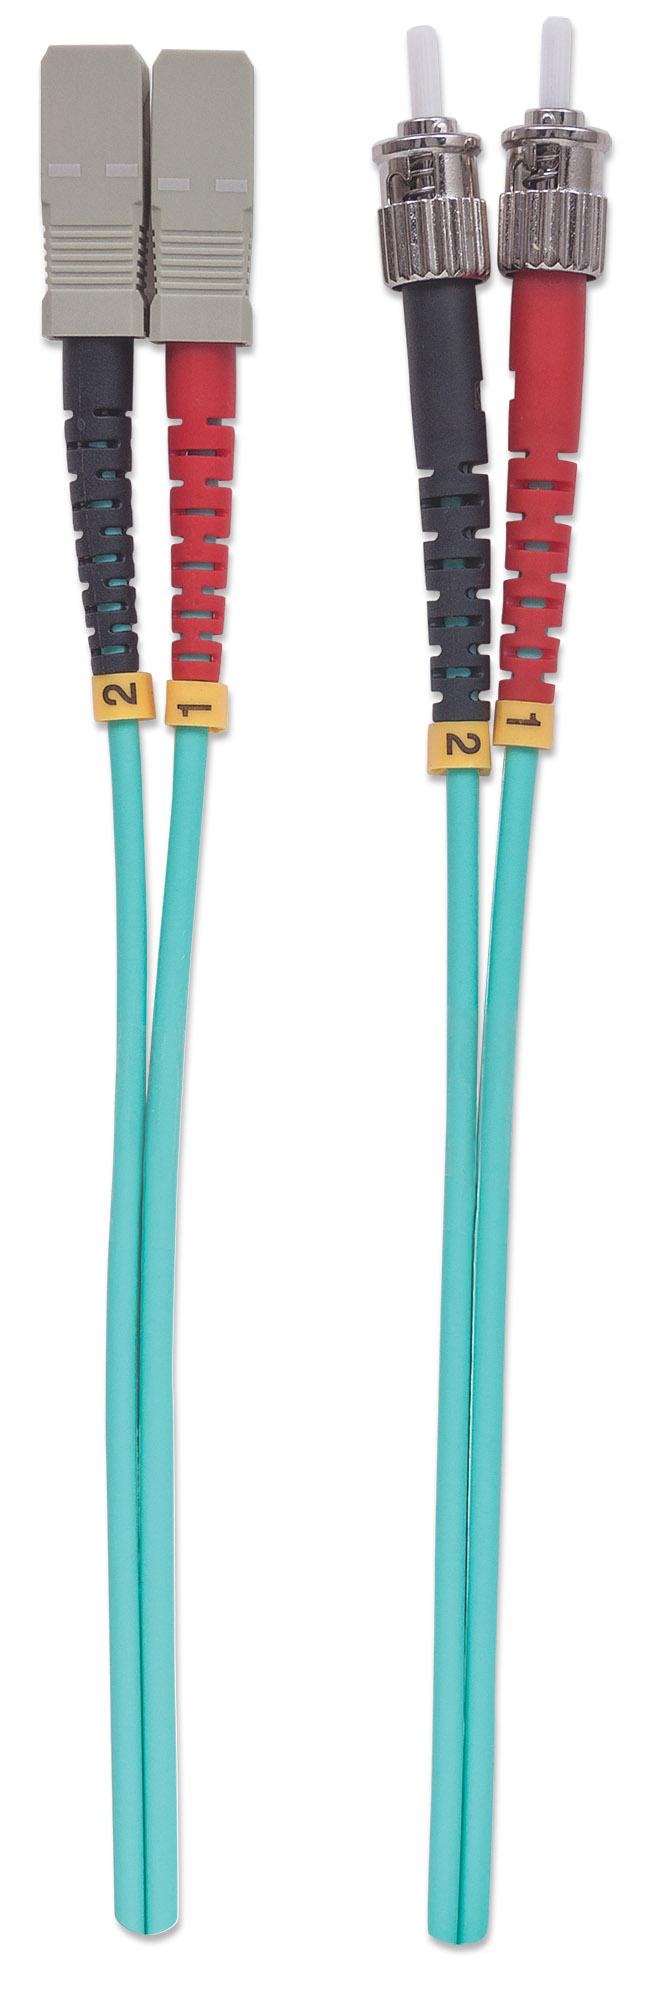 Fiber Optic Patch Cable, Duplex, Multimode